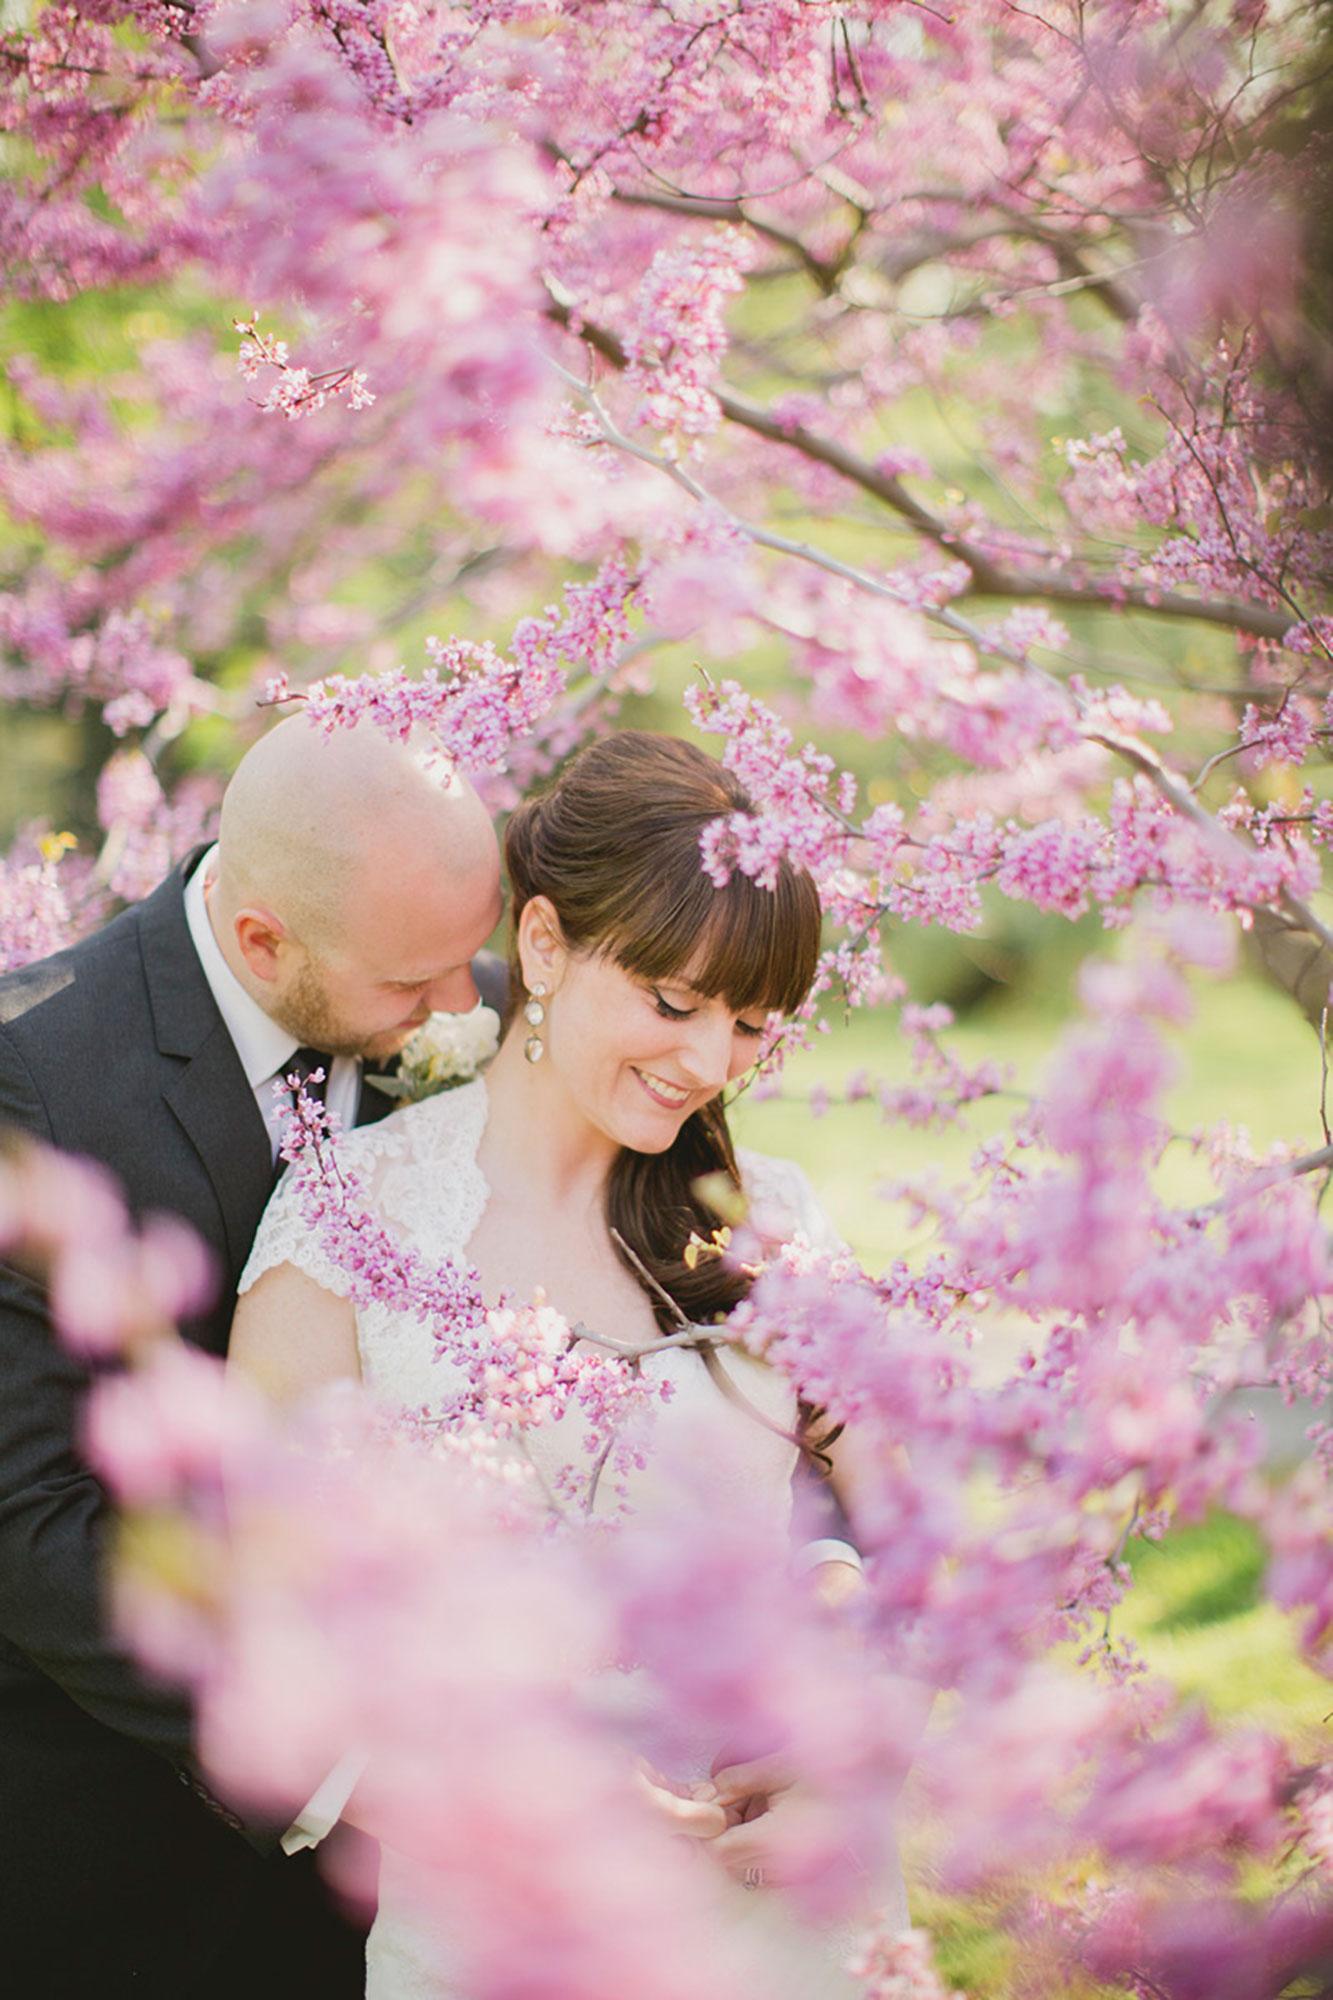 Balls-Falls-Vineyard-Bride-Photo-By-Elizabeth-in-Love-022.jpg